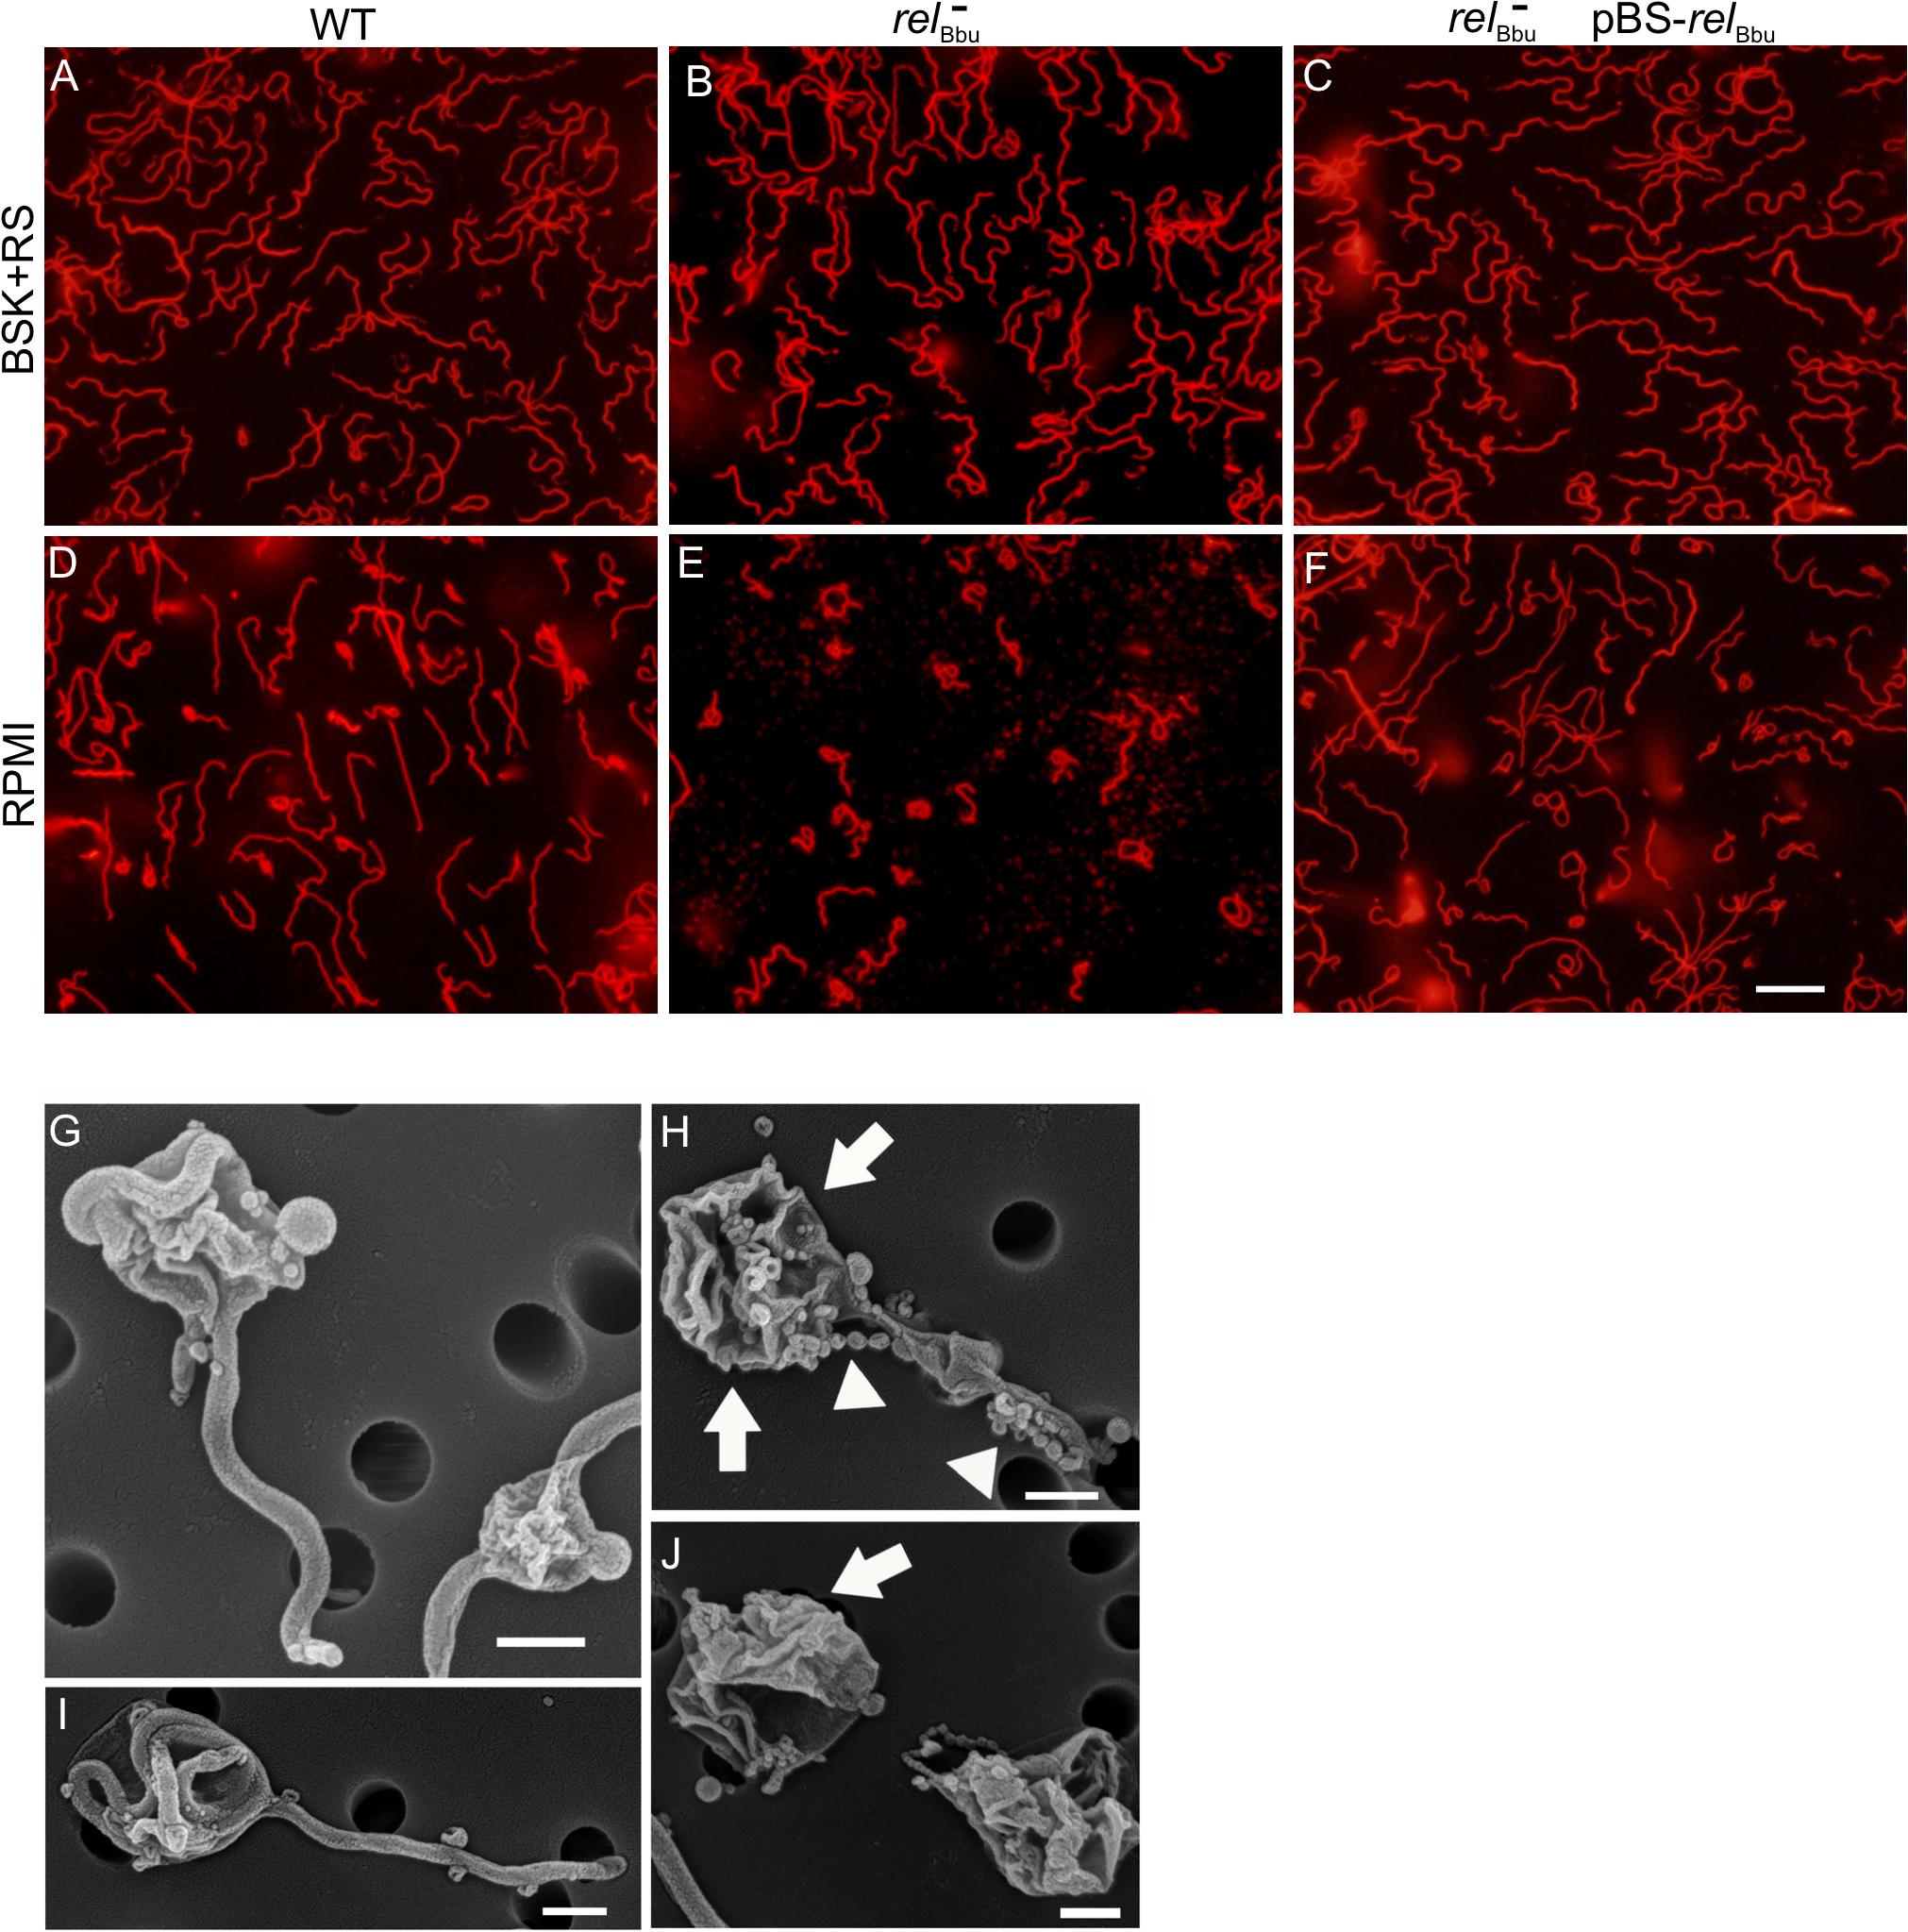 <i>rel</i><sub>Bbu</sub> regulates round body formation under starvation conditions <i>in vitro</i>.